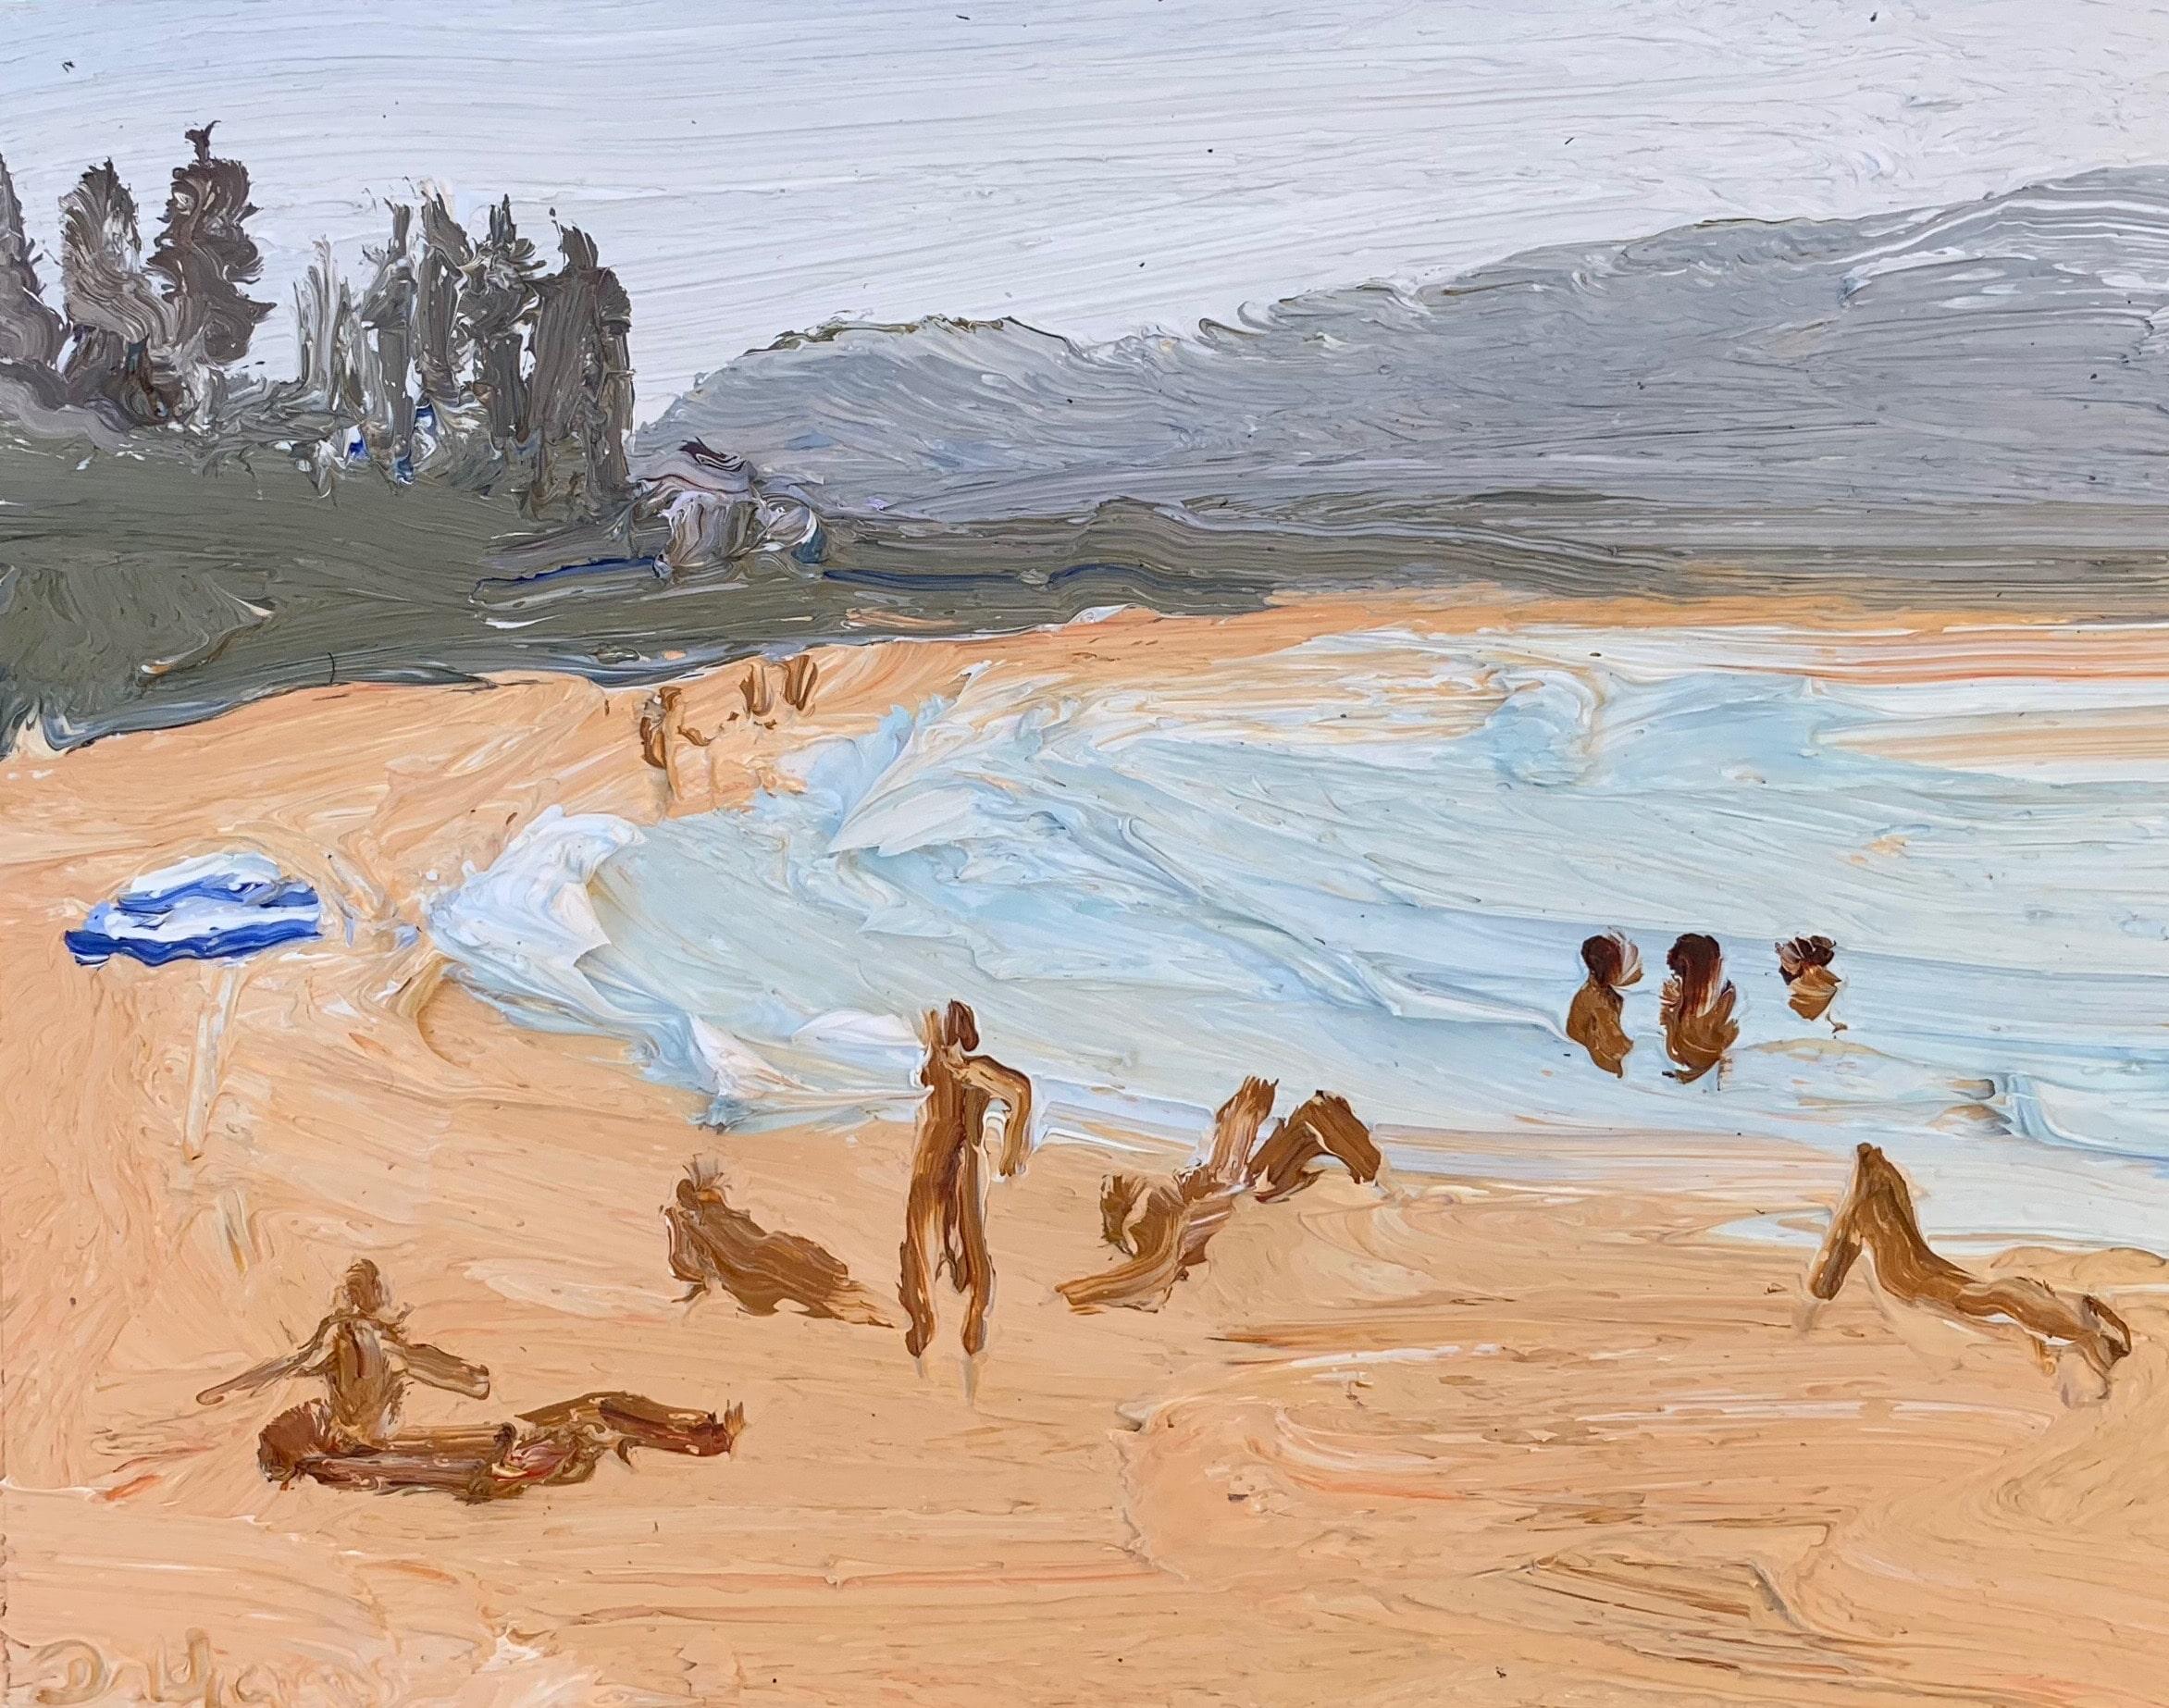 Bushfire Palmy 1-Endless Summer-Plein air-Oil on oil paper-50cm x 55cm framed-David K Wiggs 2019